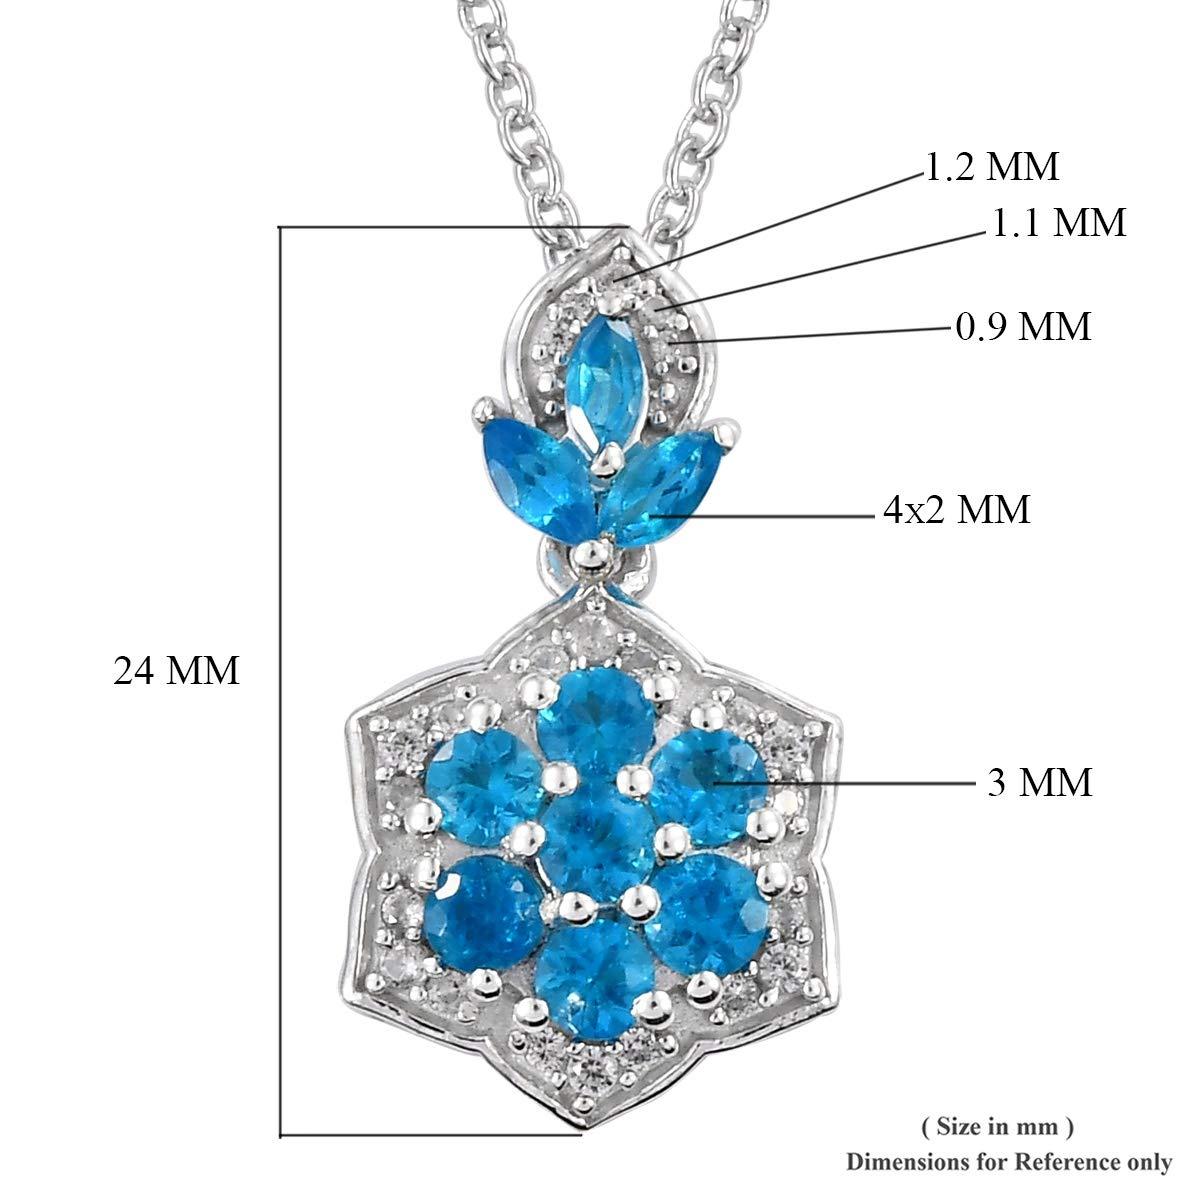 Malgache Neon Apatite Zirconia Flower Pendant Necklace 20 Platinum Plated 925 Sterling Silver Jewelry for Women